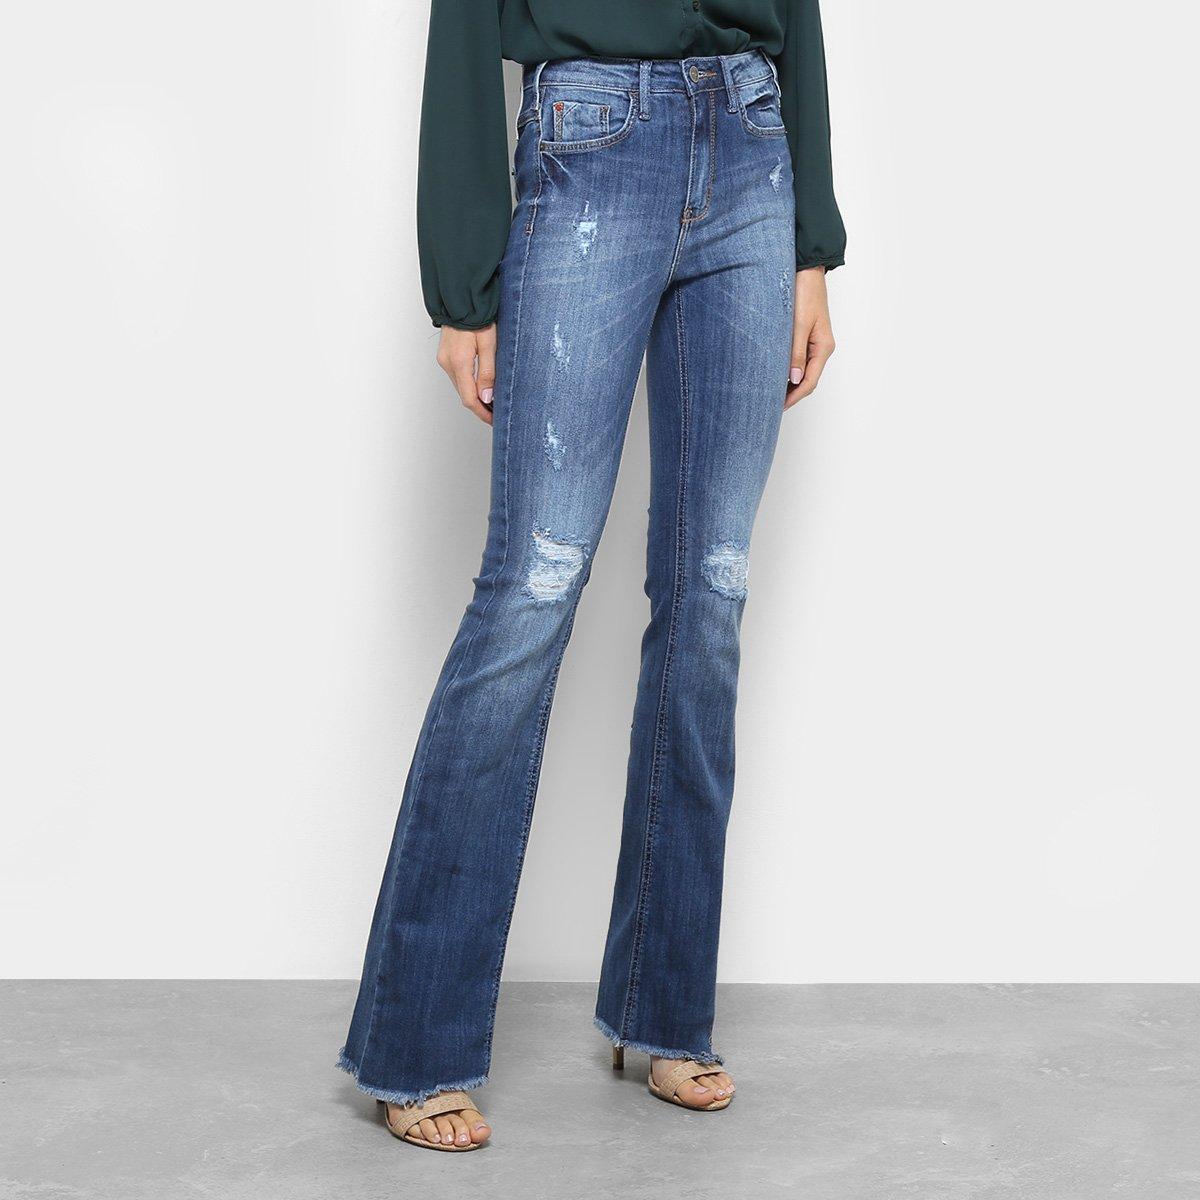 Calça Jeans Flare Forum Estonada Cintura Alta Feminina - Azul ... cd5817ef34